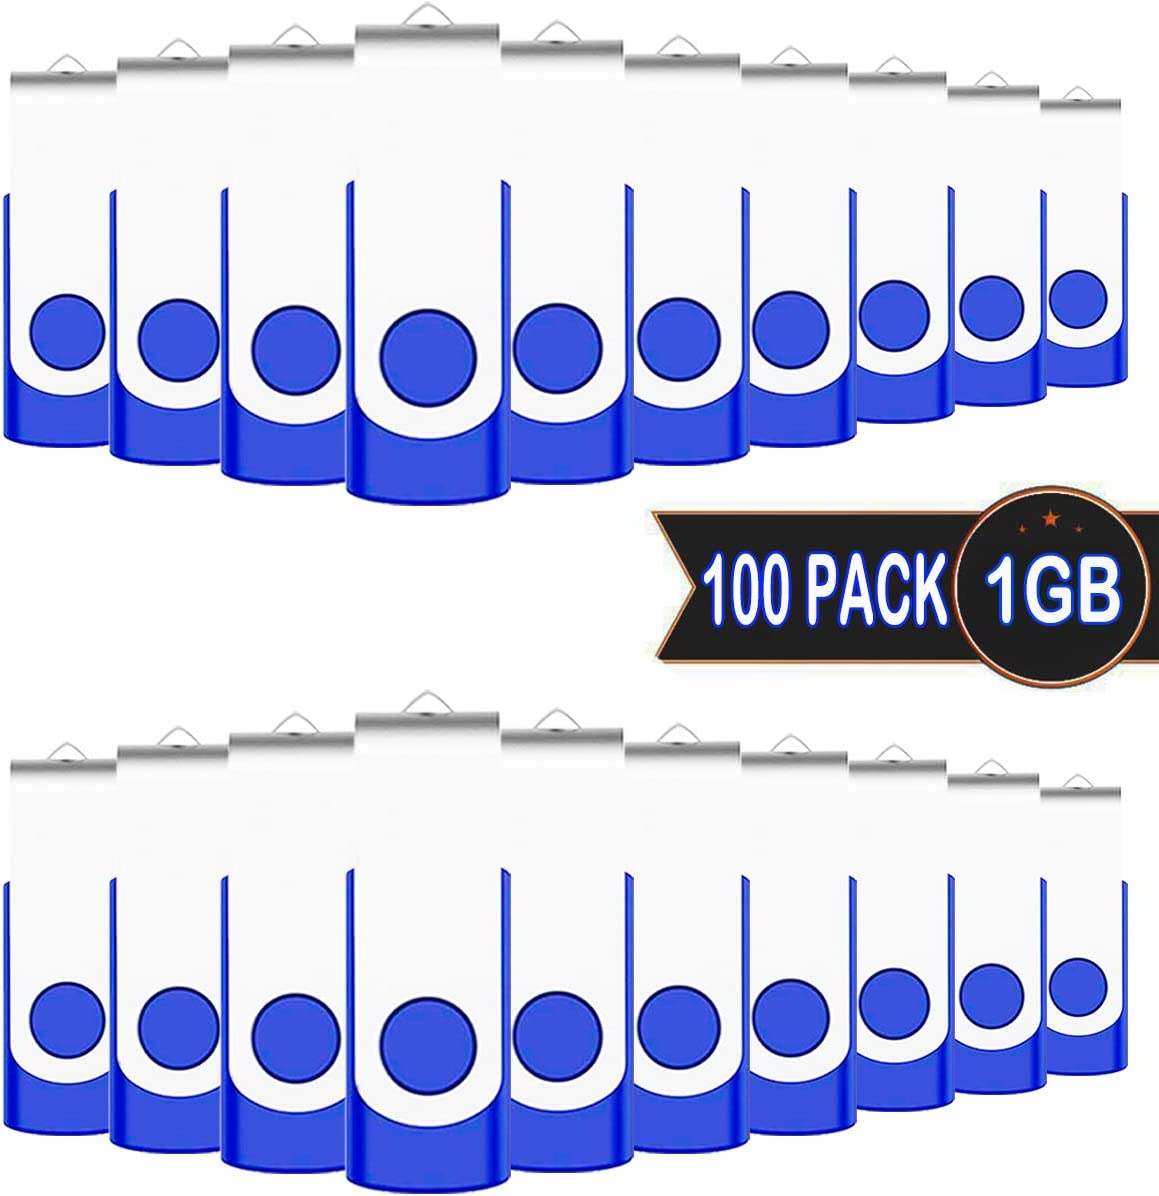 EASTBULL USB 2.0 Swivel Bulk Flash Drives USB Stick Gig Stick Metal Thumb Fold Storage USB 512MB Flash Drives 20 Pack Blue